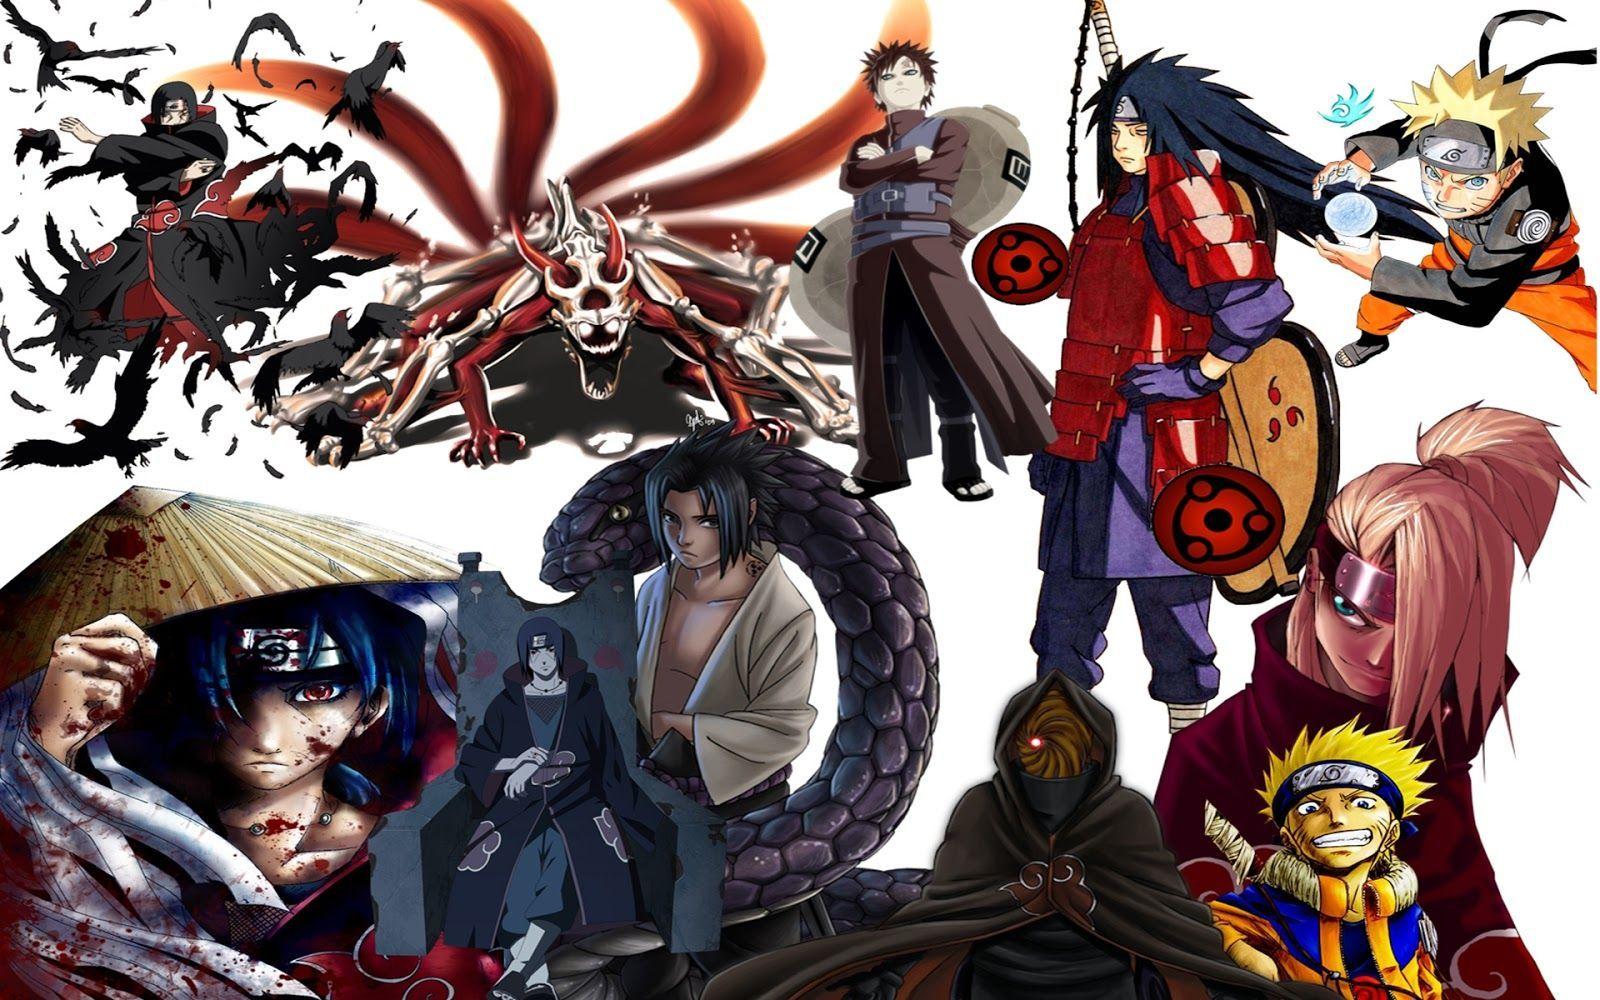 Fantastic Wallpaper Macbook Naruto - 7171defa52b403bd9645c8dee4f60c09  Perfect Image Reference_376542.jpg